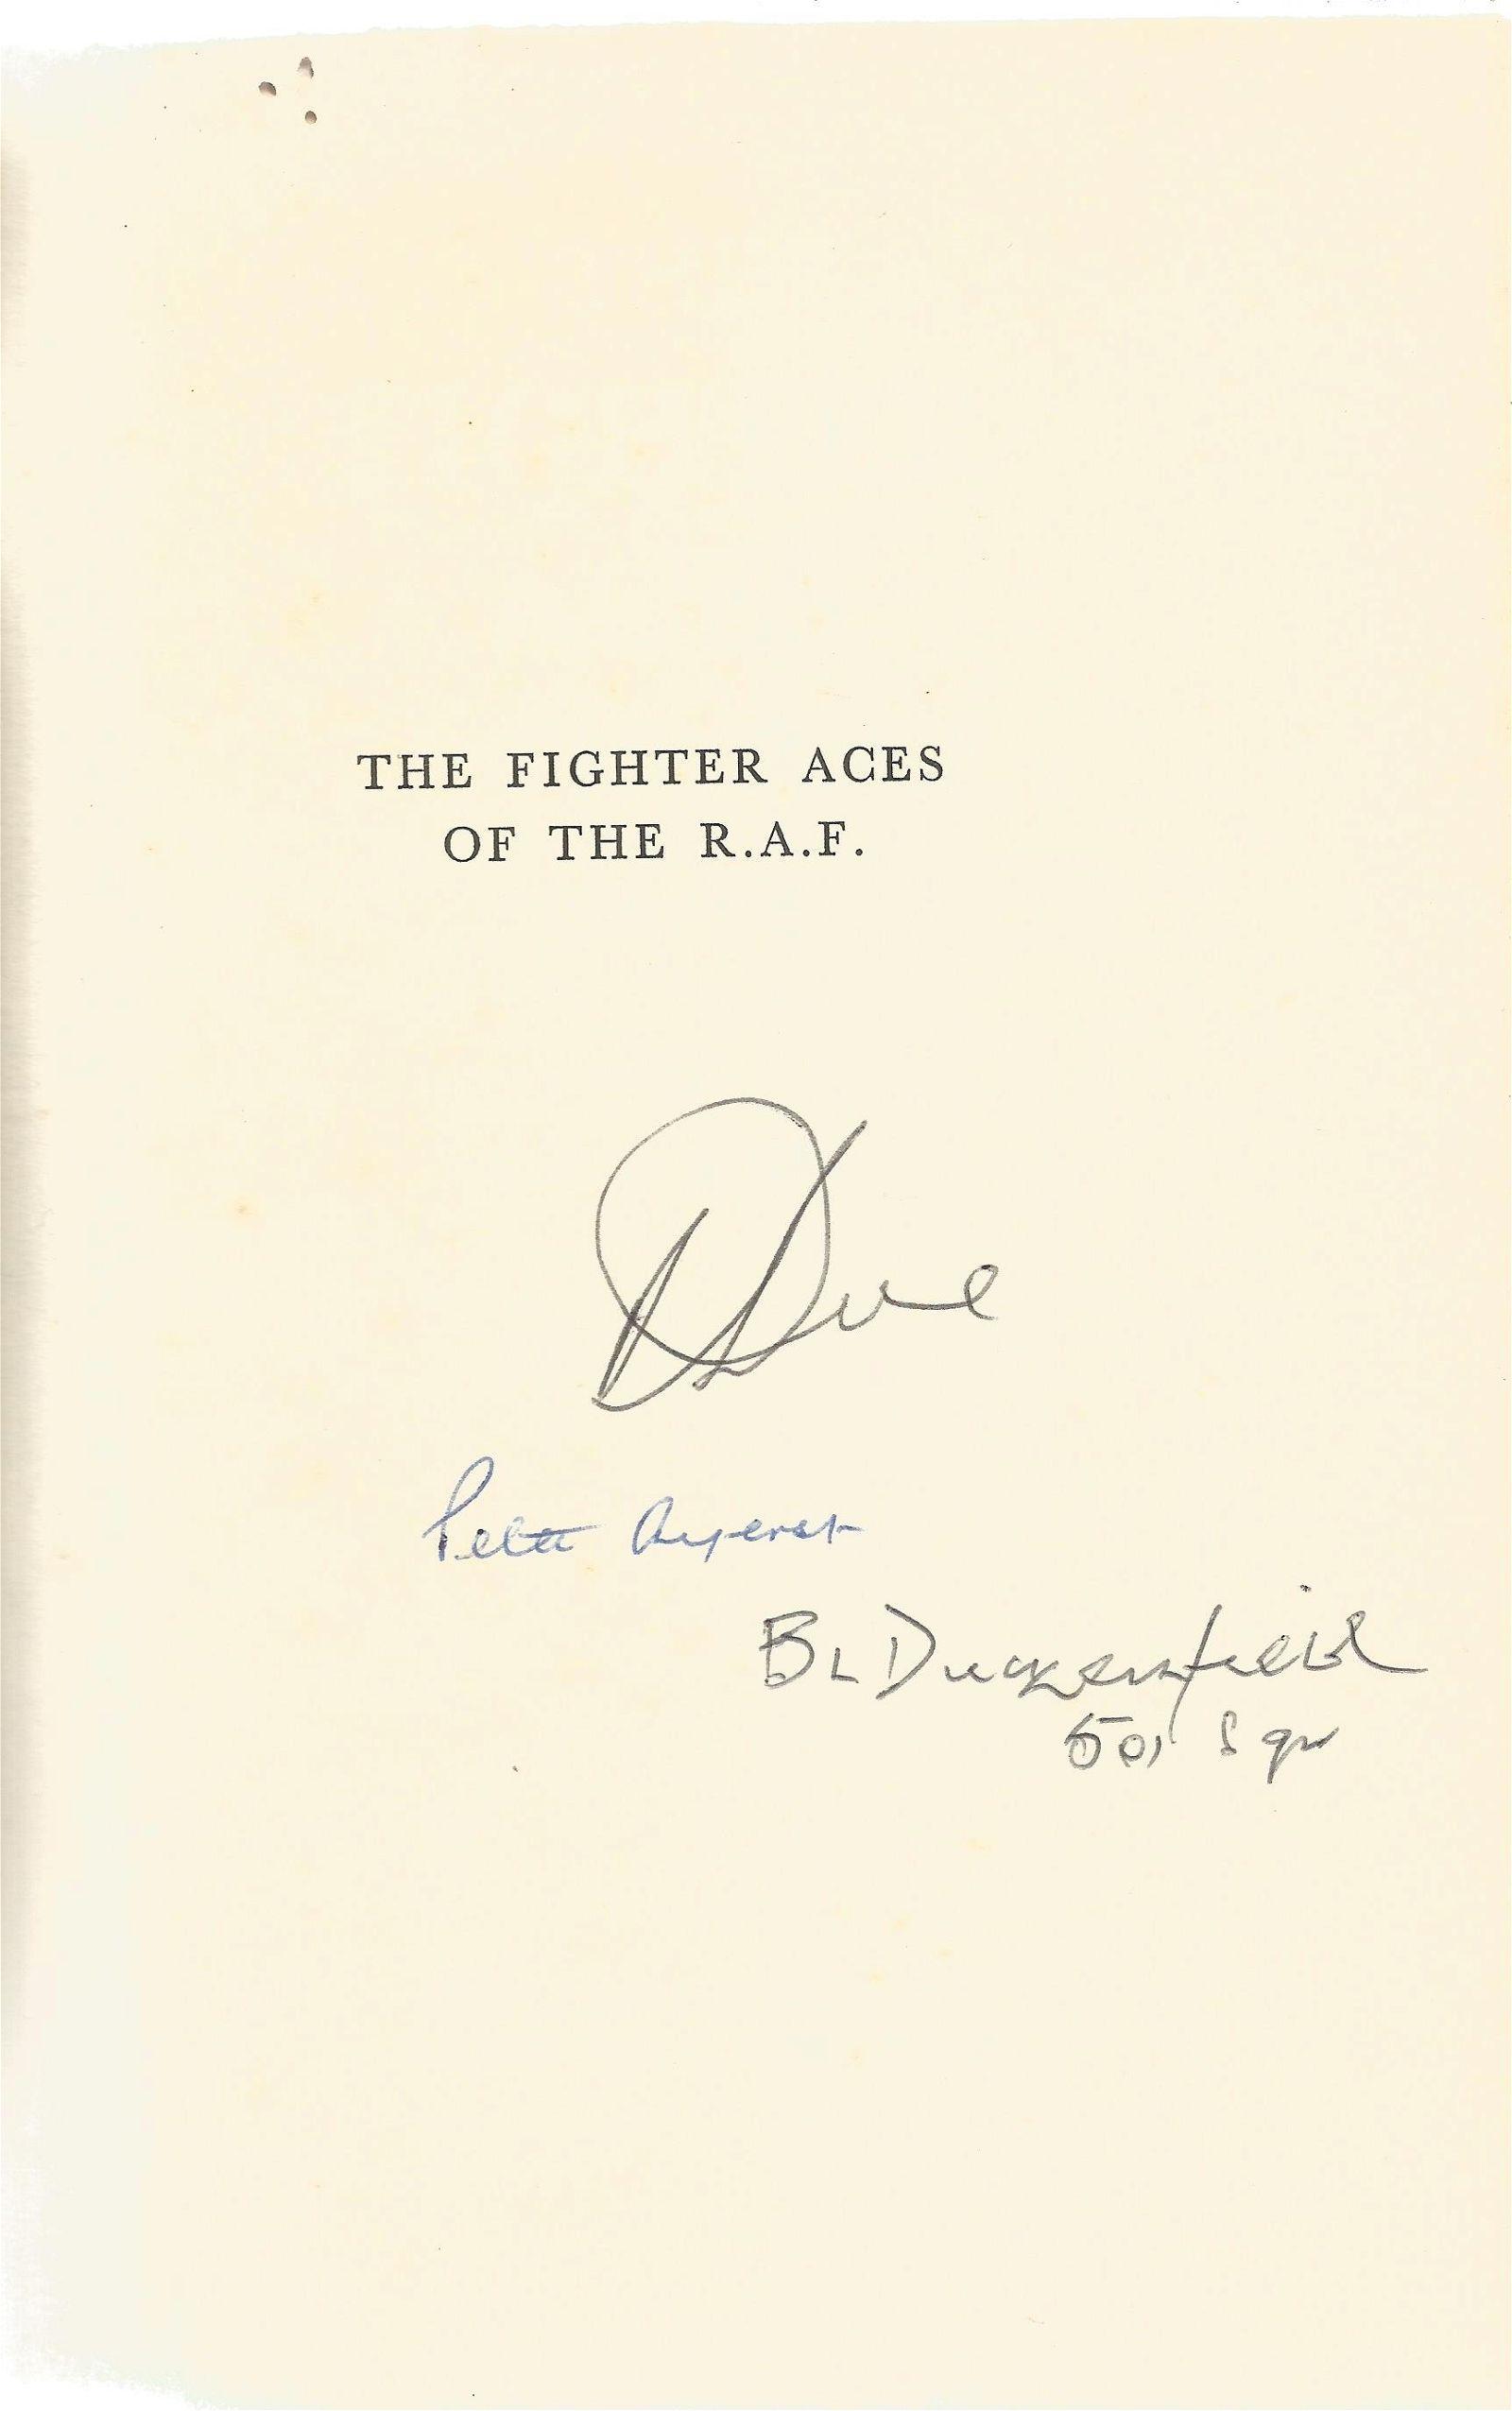 World War II multi signed hardback book titled The